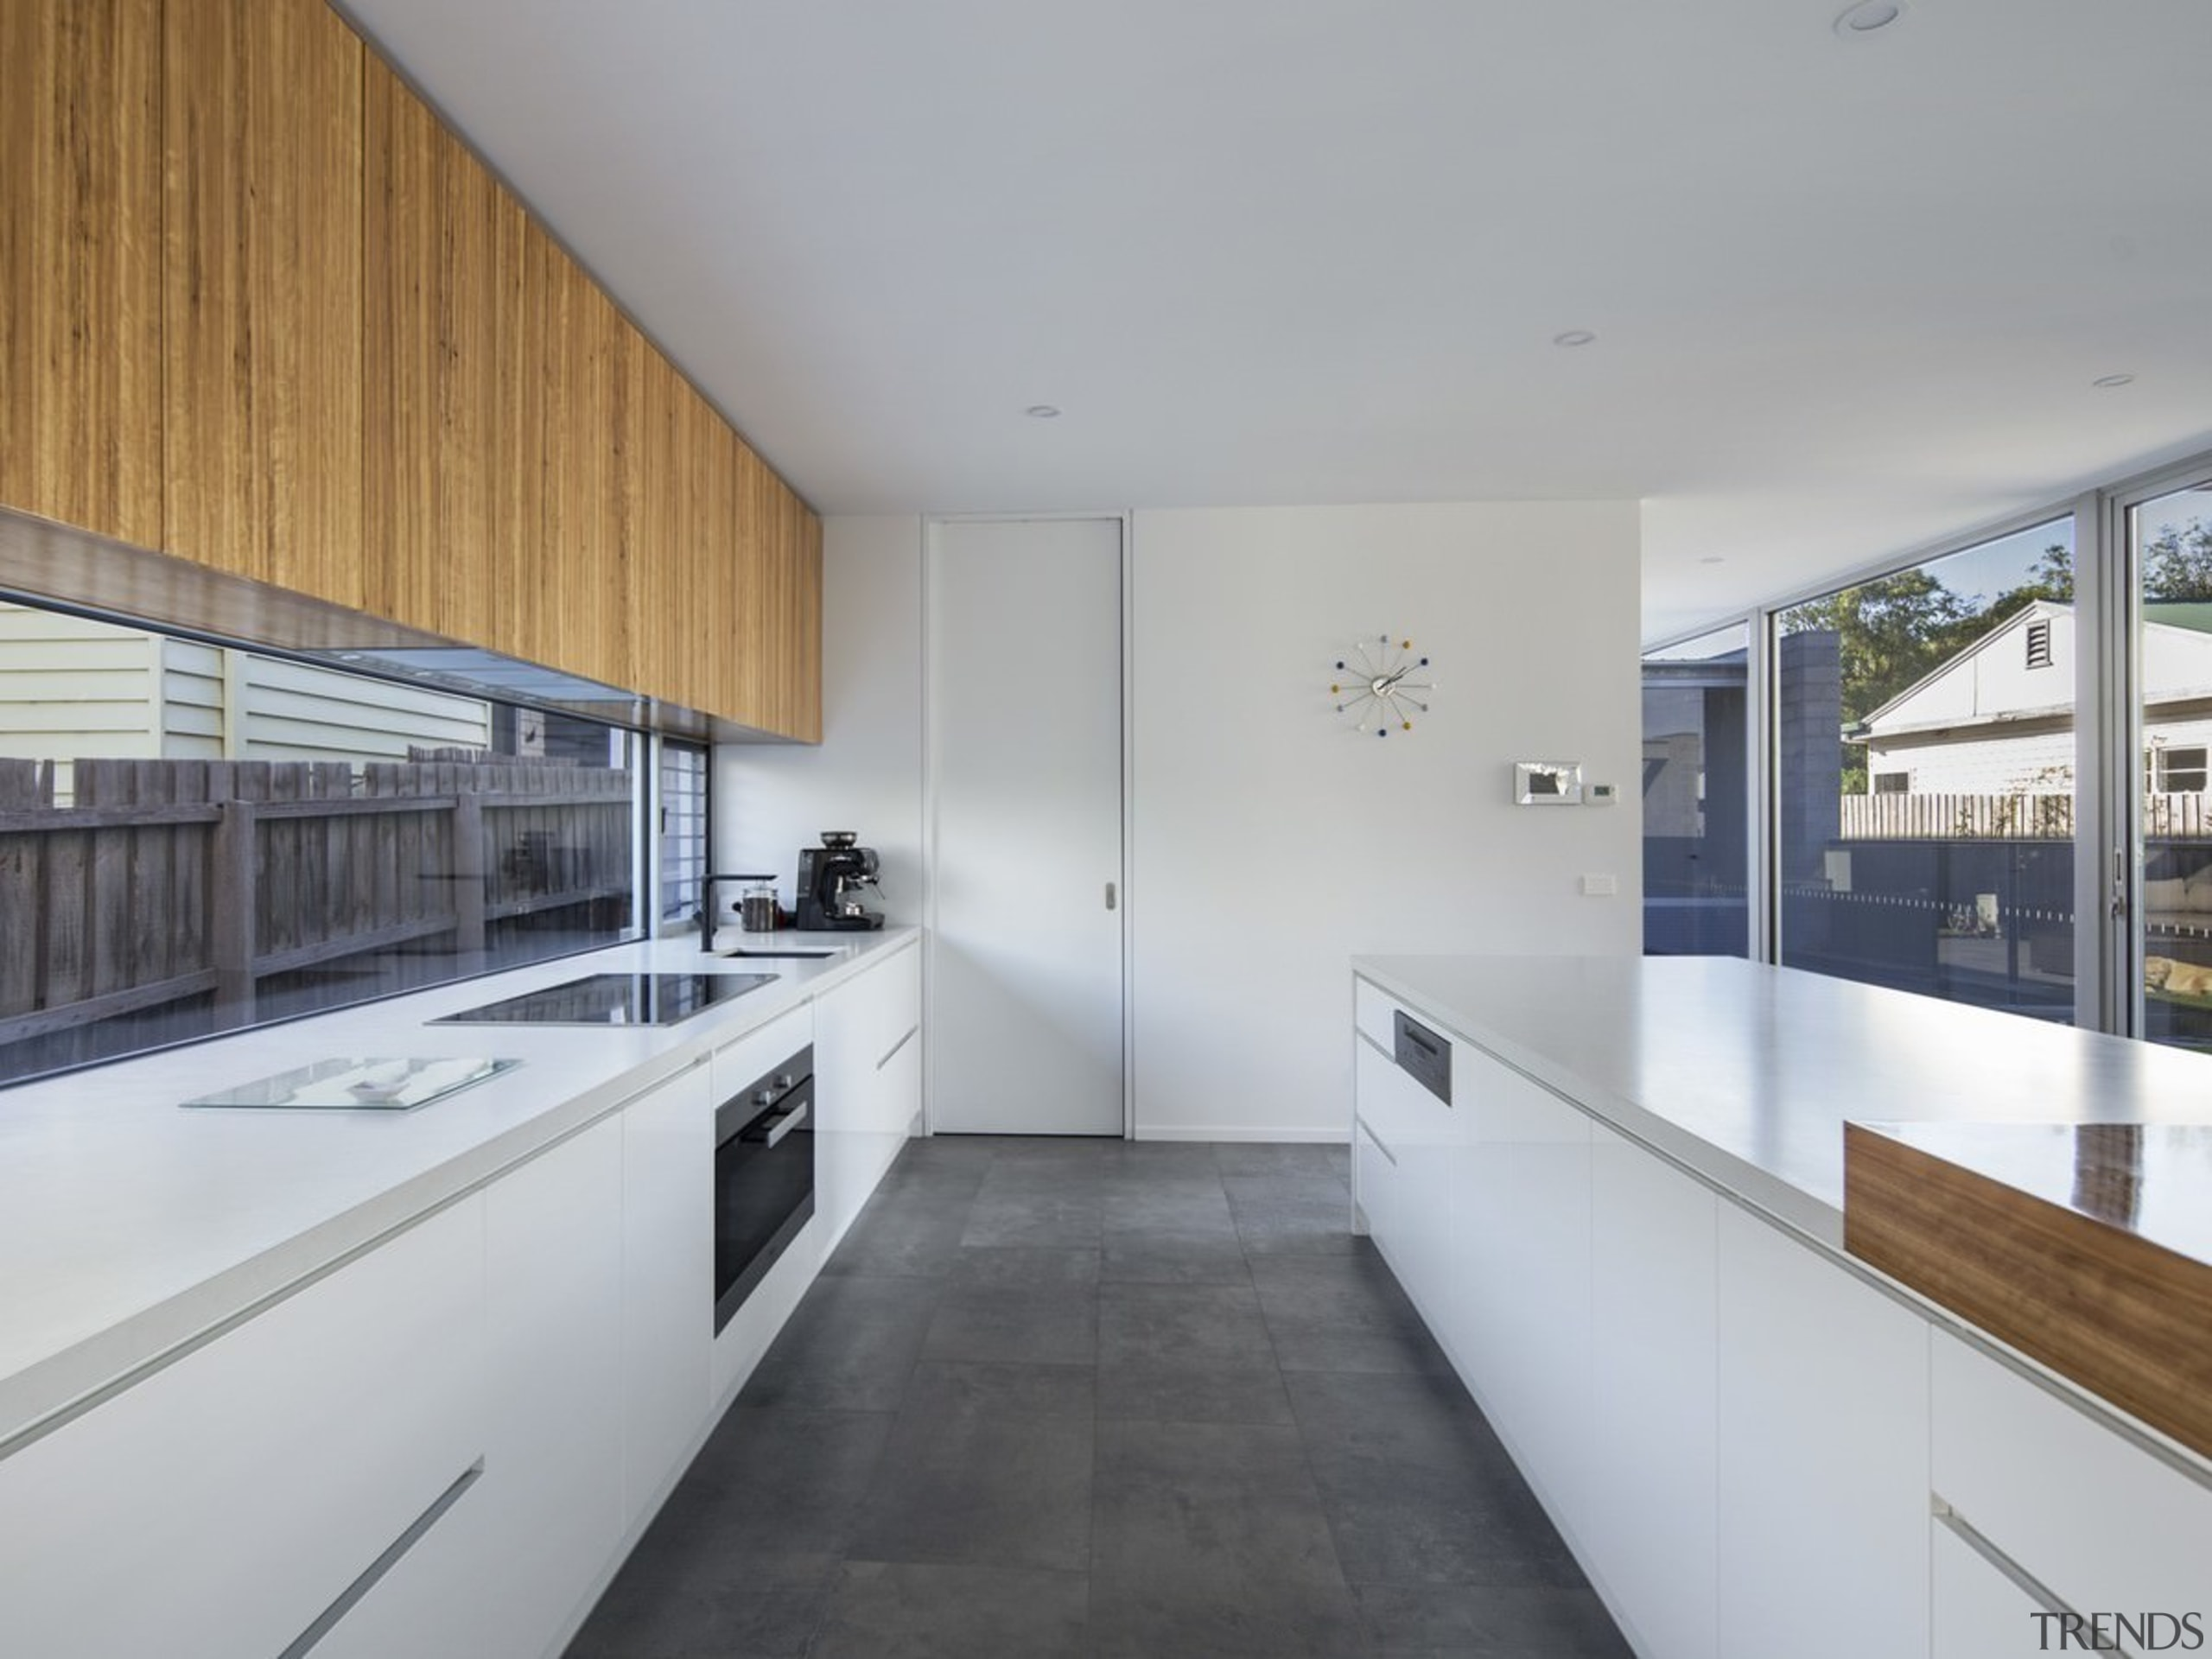 This large kitchen has a unique splashback  architecture, countertop, house, interior design, kitchen, real estate, gray